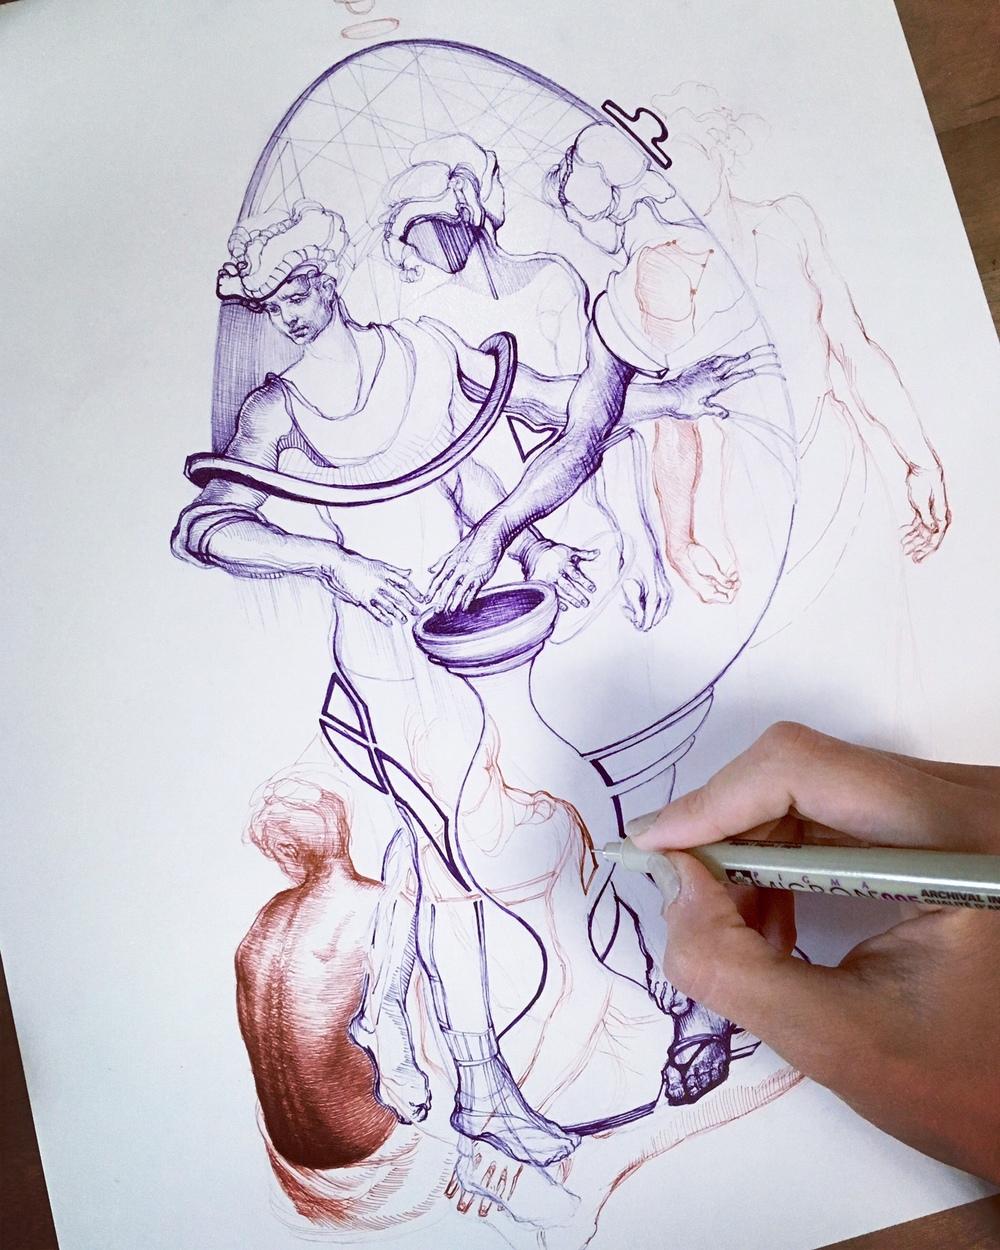 Maria kreyn+doodle+.JPG